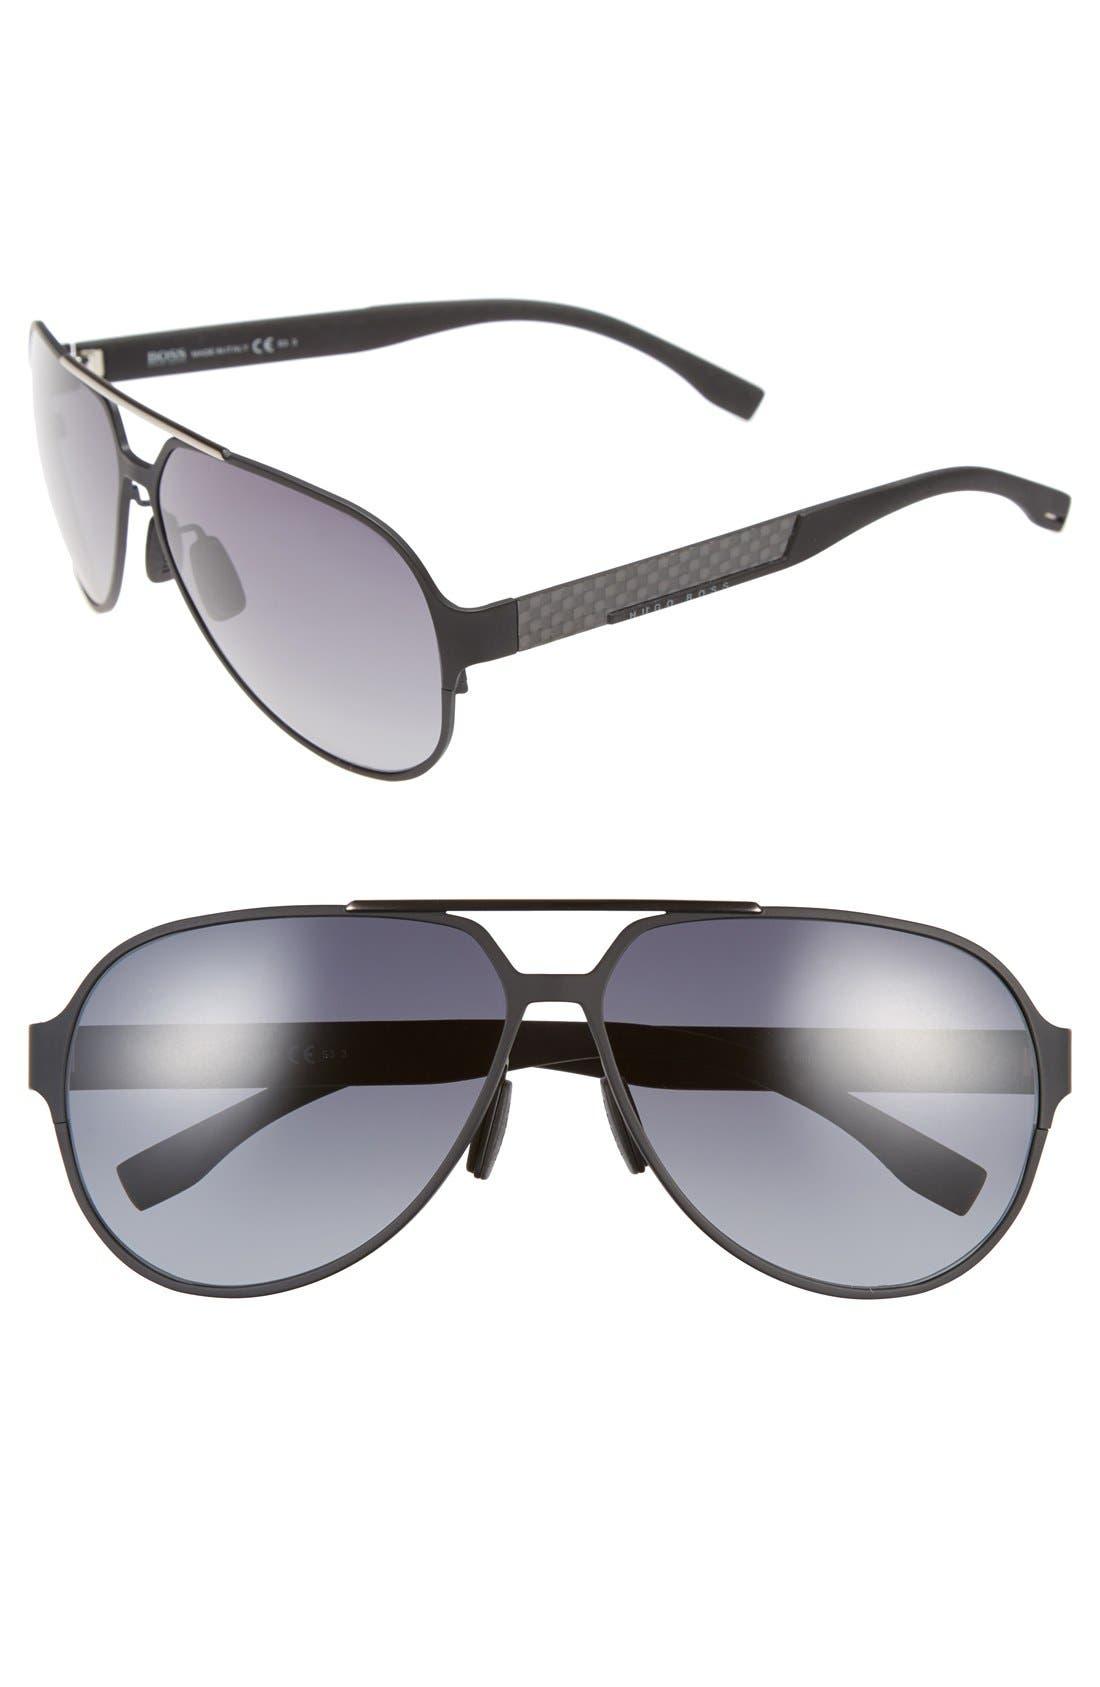 63mm Aviator Sunglasses,                         Main,                         color, Black Ruthenium/ Grey Gradient